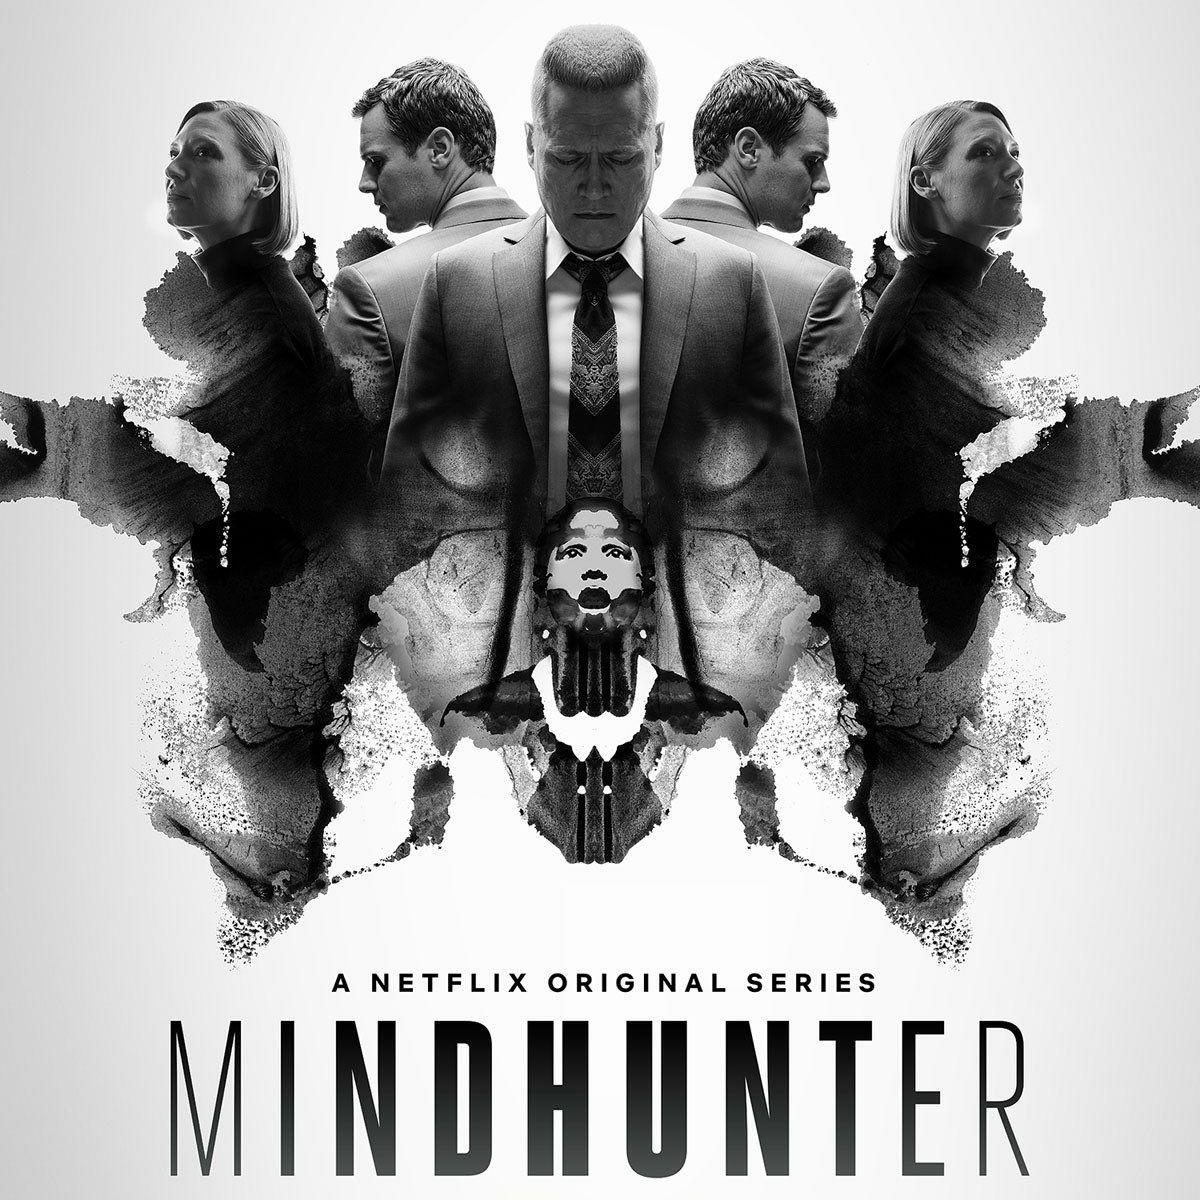 [Série TV] Mindhunter (16+) Mindhunter-saison-2-affiche-us-1094979